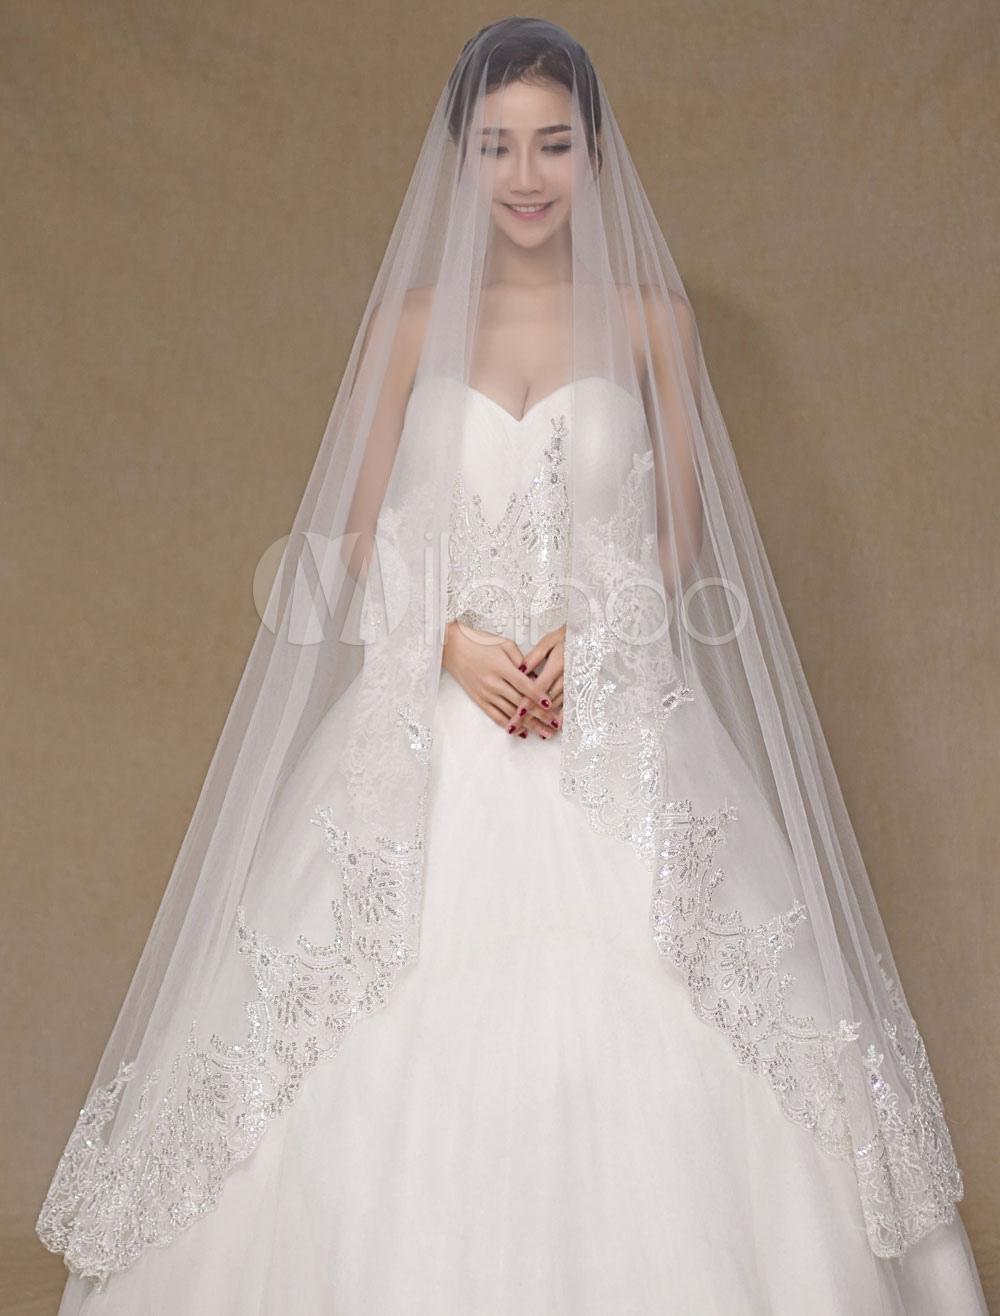 Ivory One-Tier Wedding Veil Applique Tulle Lace Bridal Veil (300cm Length)